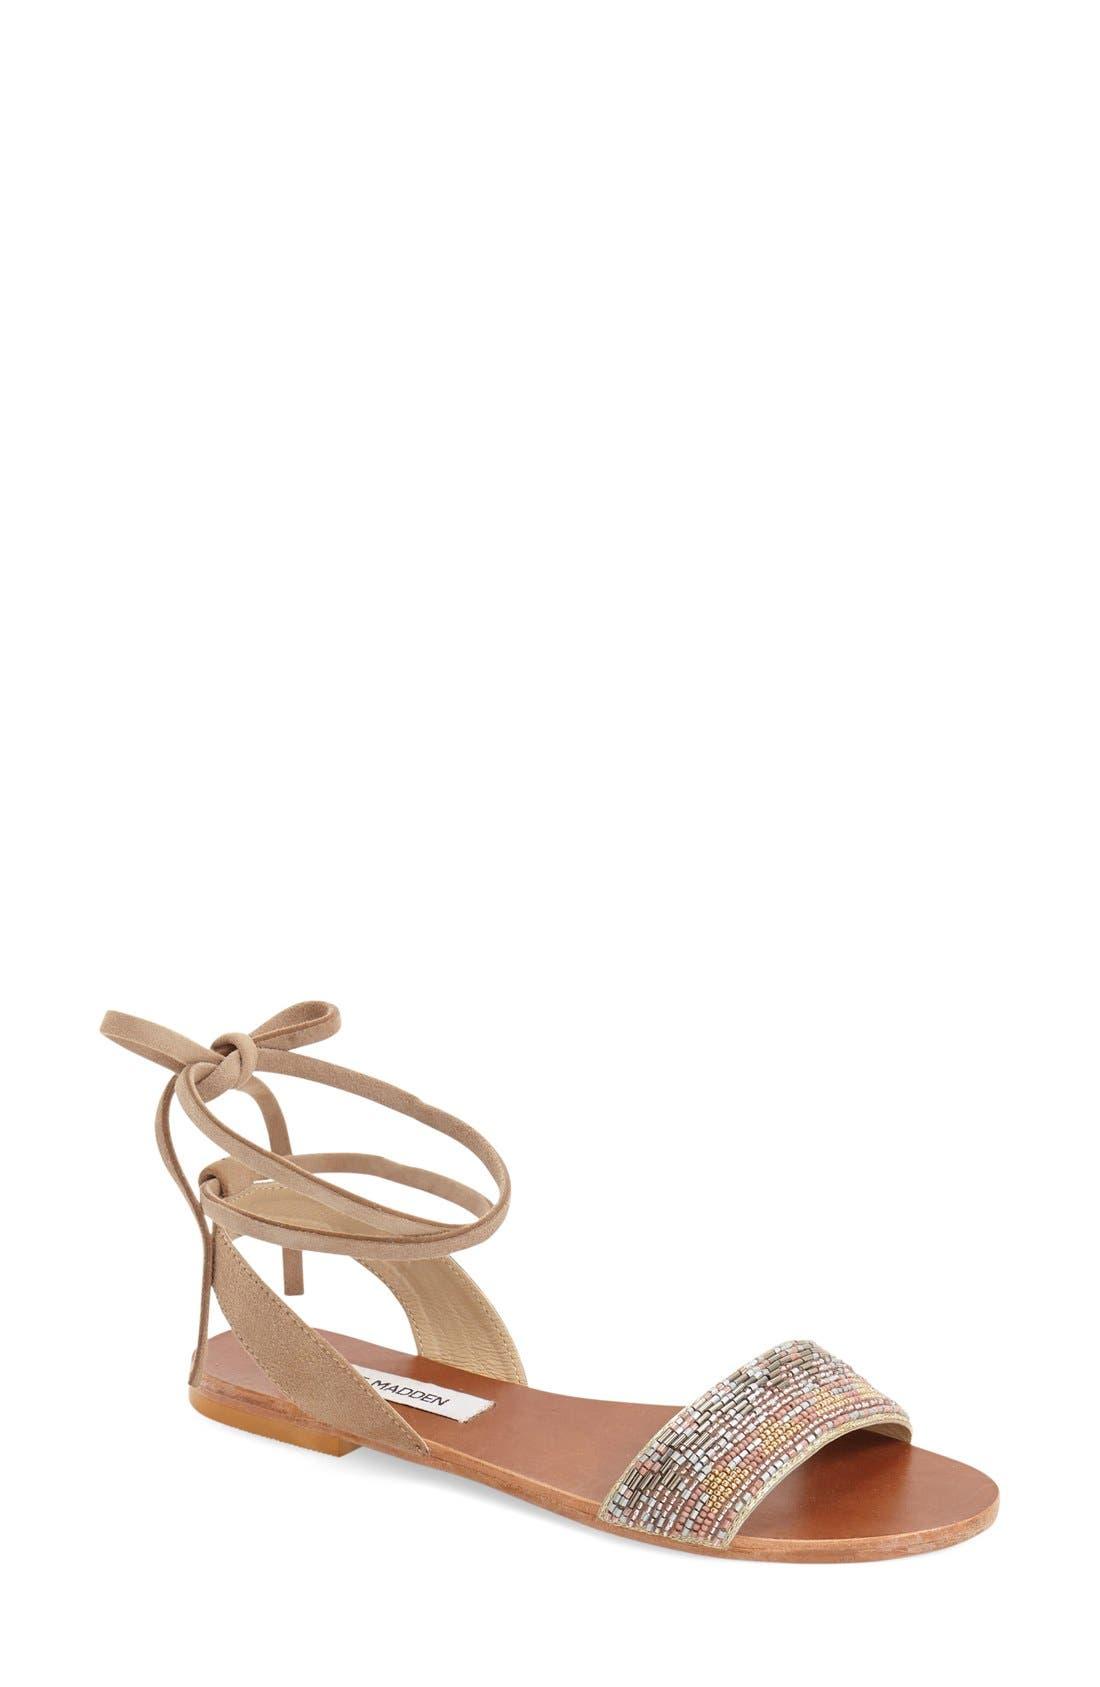 'Shaney' Beaded Wraparound Lace Sandal,                             Main thumbnail 1, color,                             250